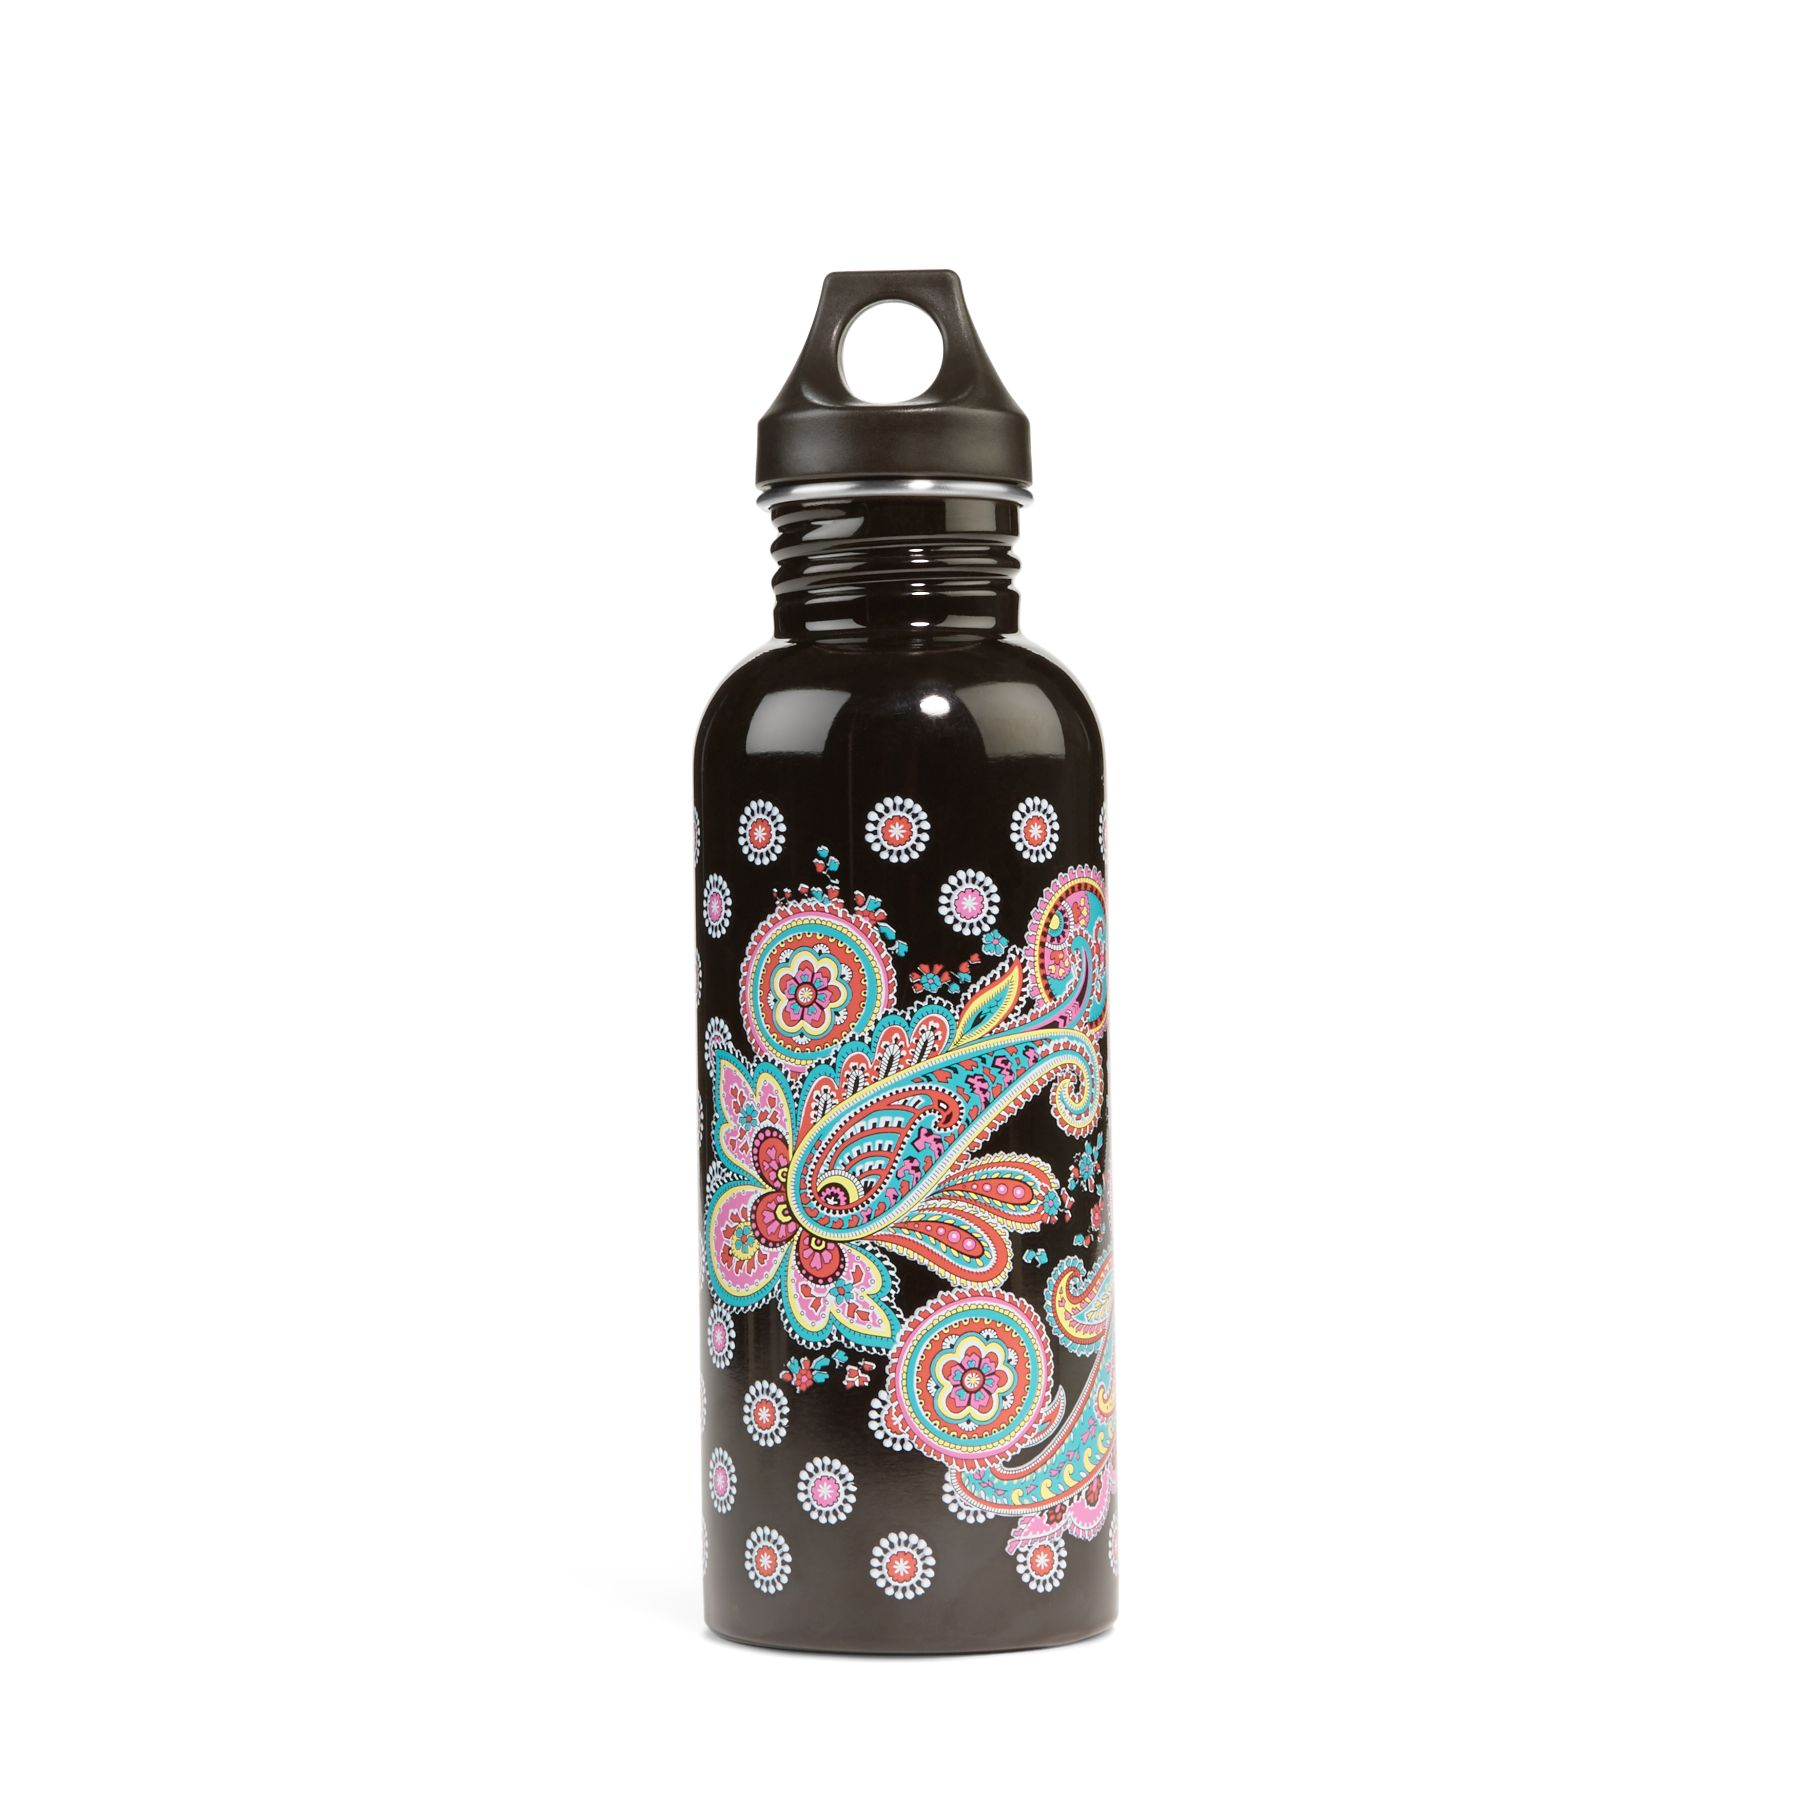 Vera Bradley 25 oz. Water Bottle in Parisian Paisley